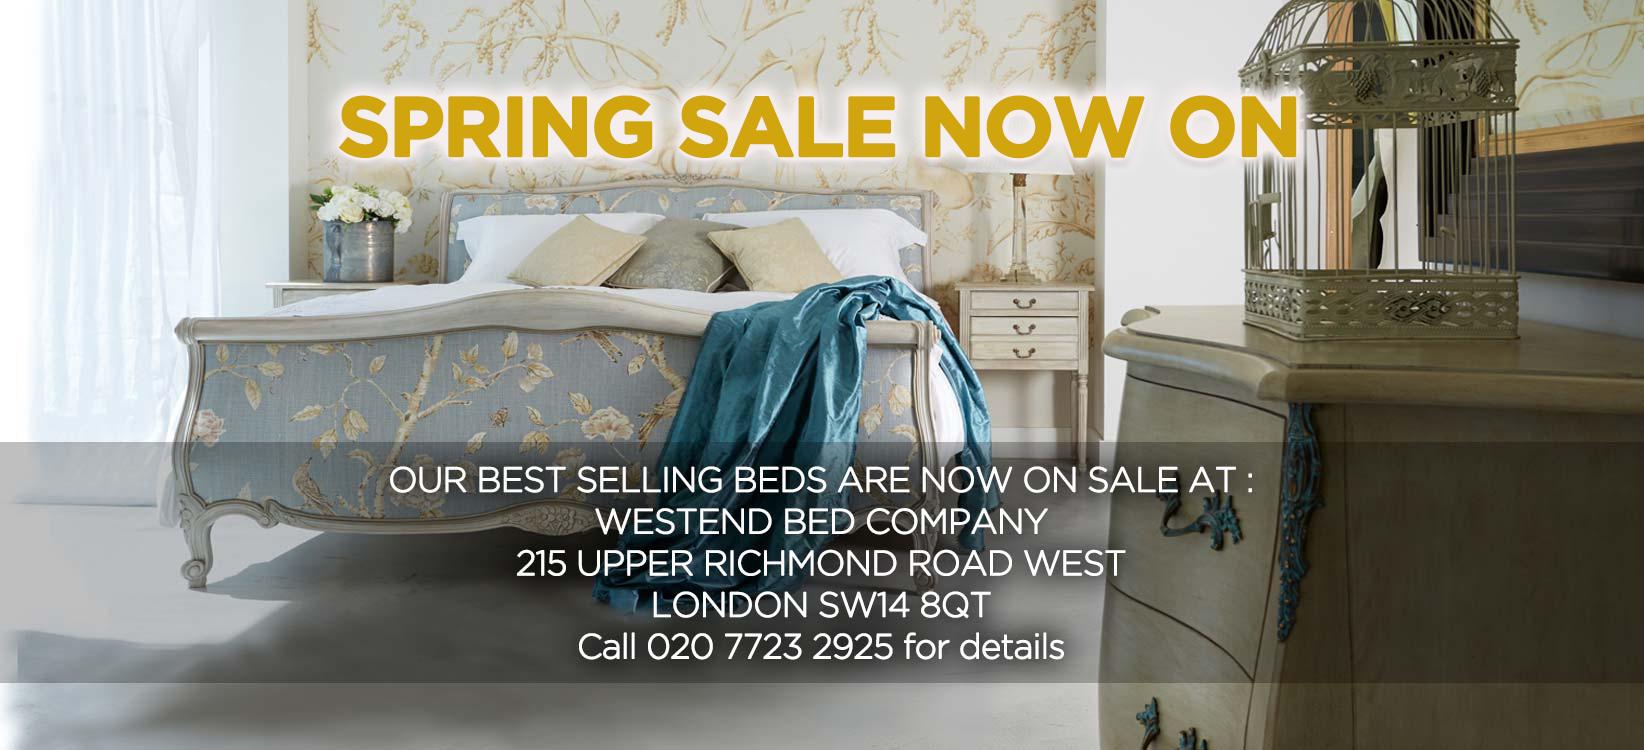 Simon Horn Spring Sale 2